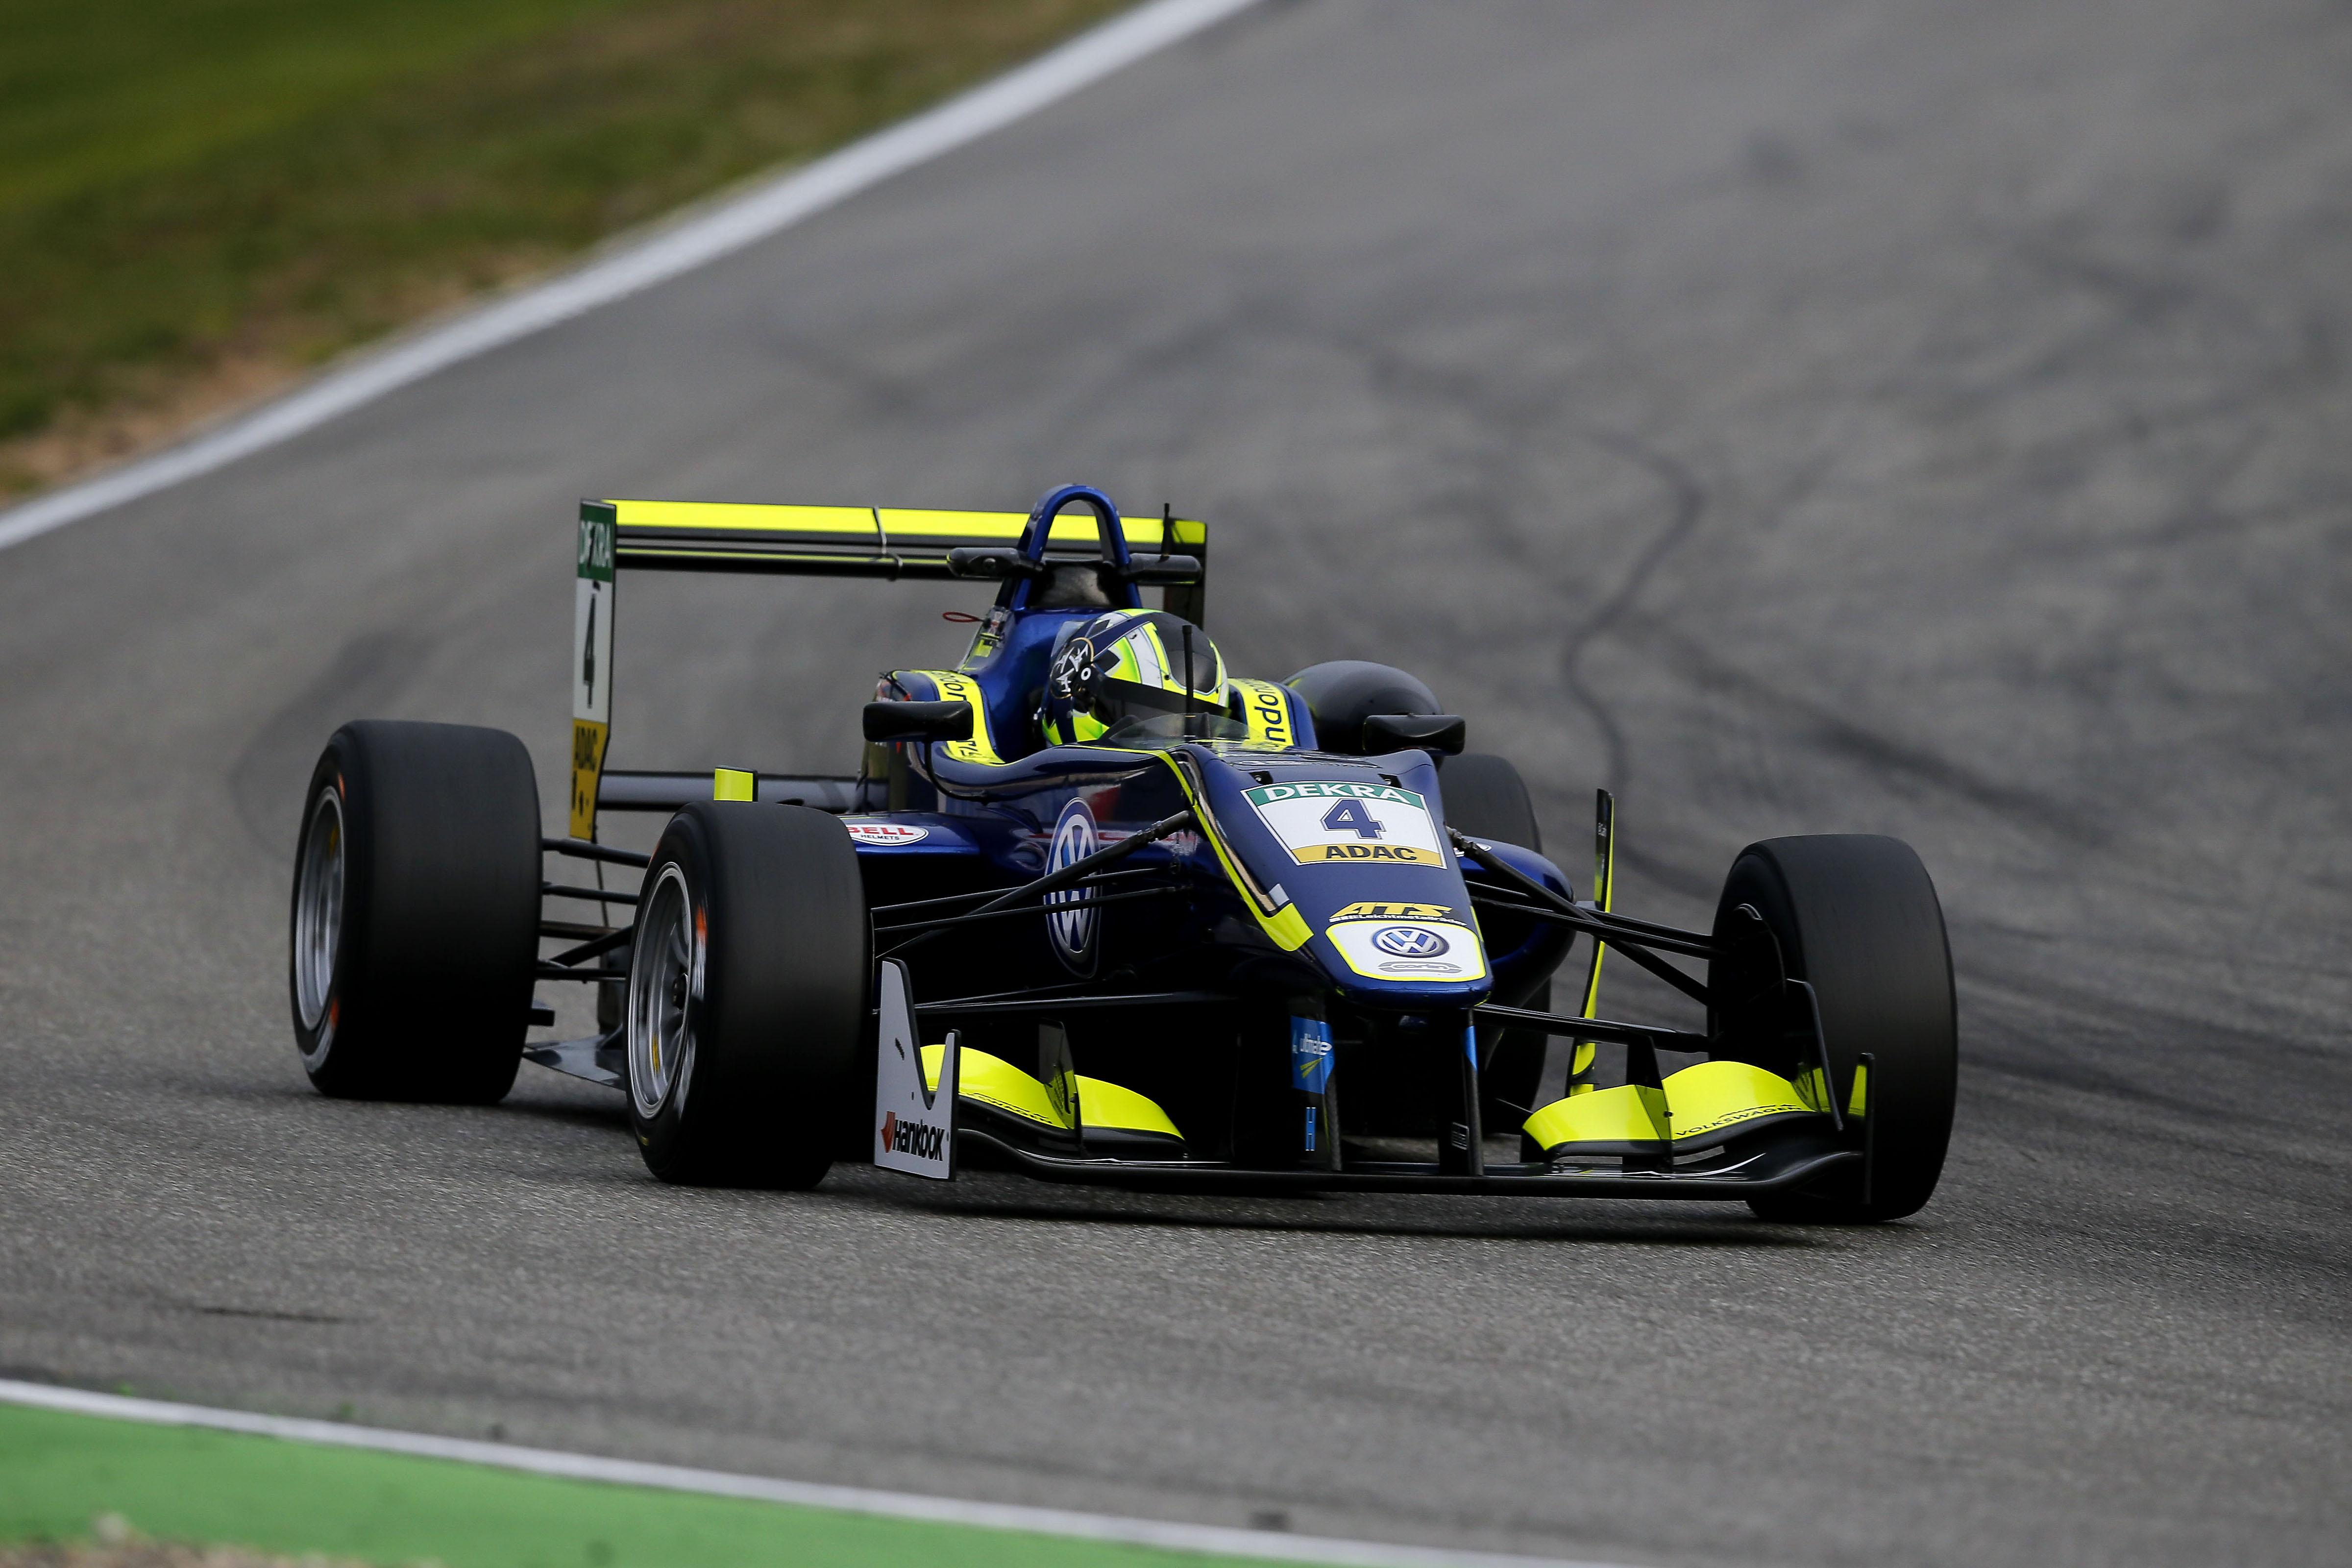 Fia F3 European Championship 2016, Round 10, Hockenheimring, Germany